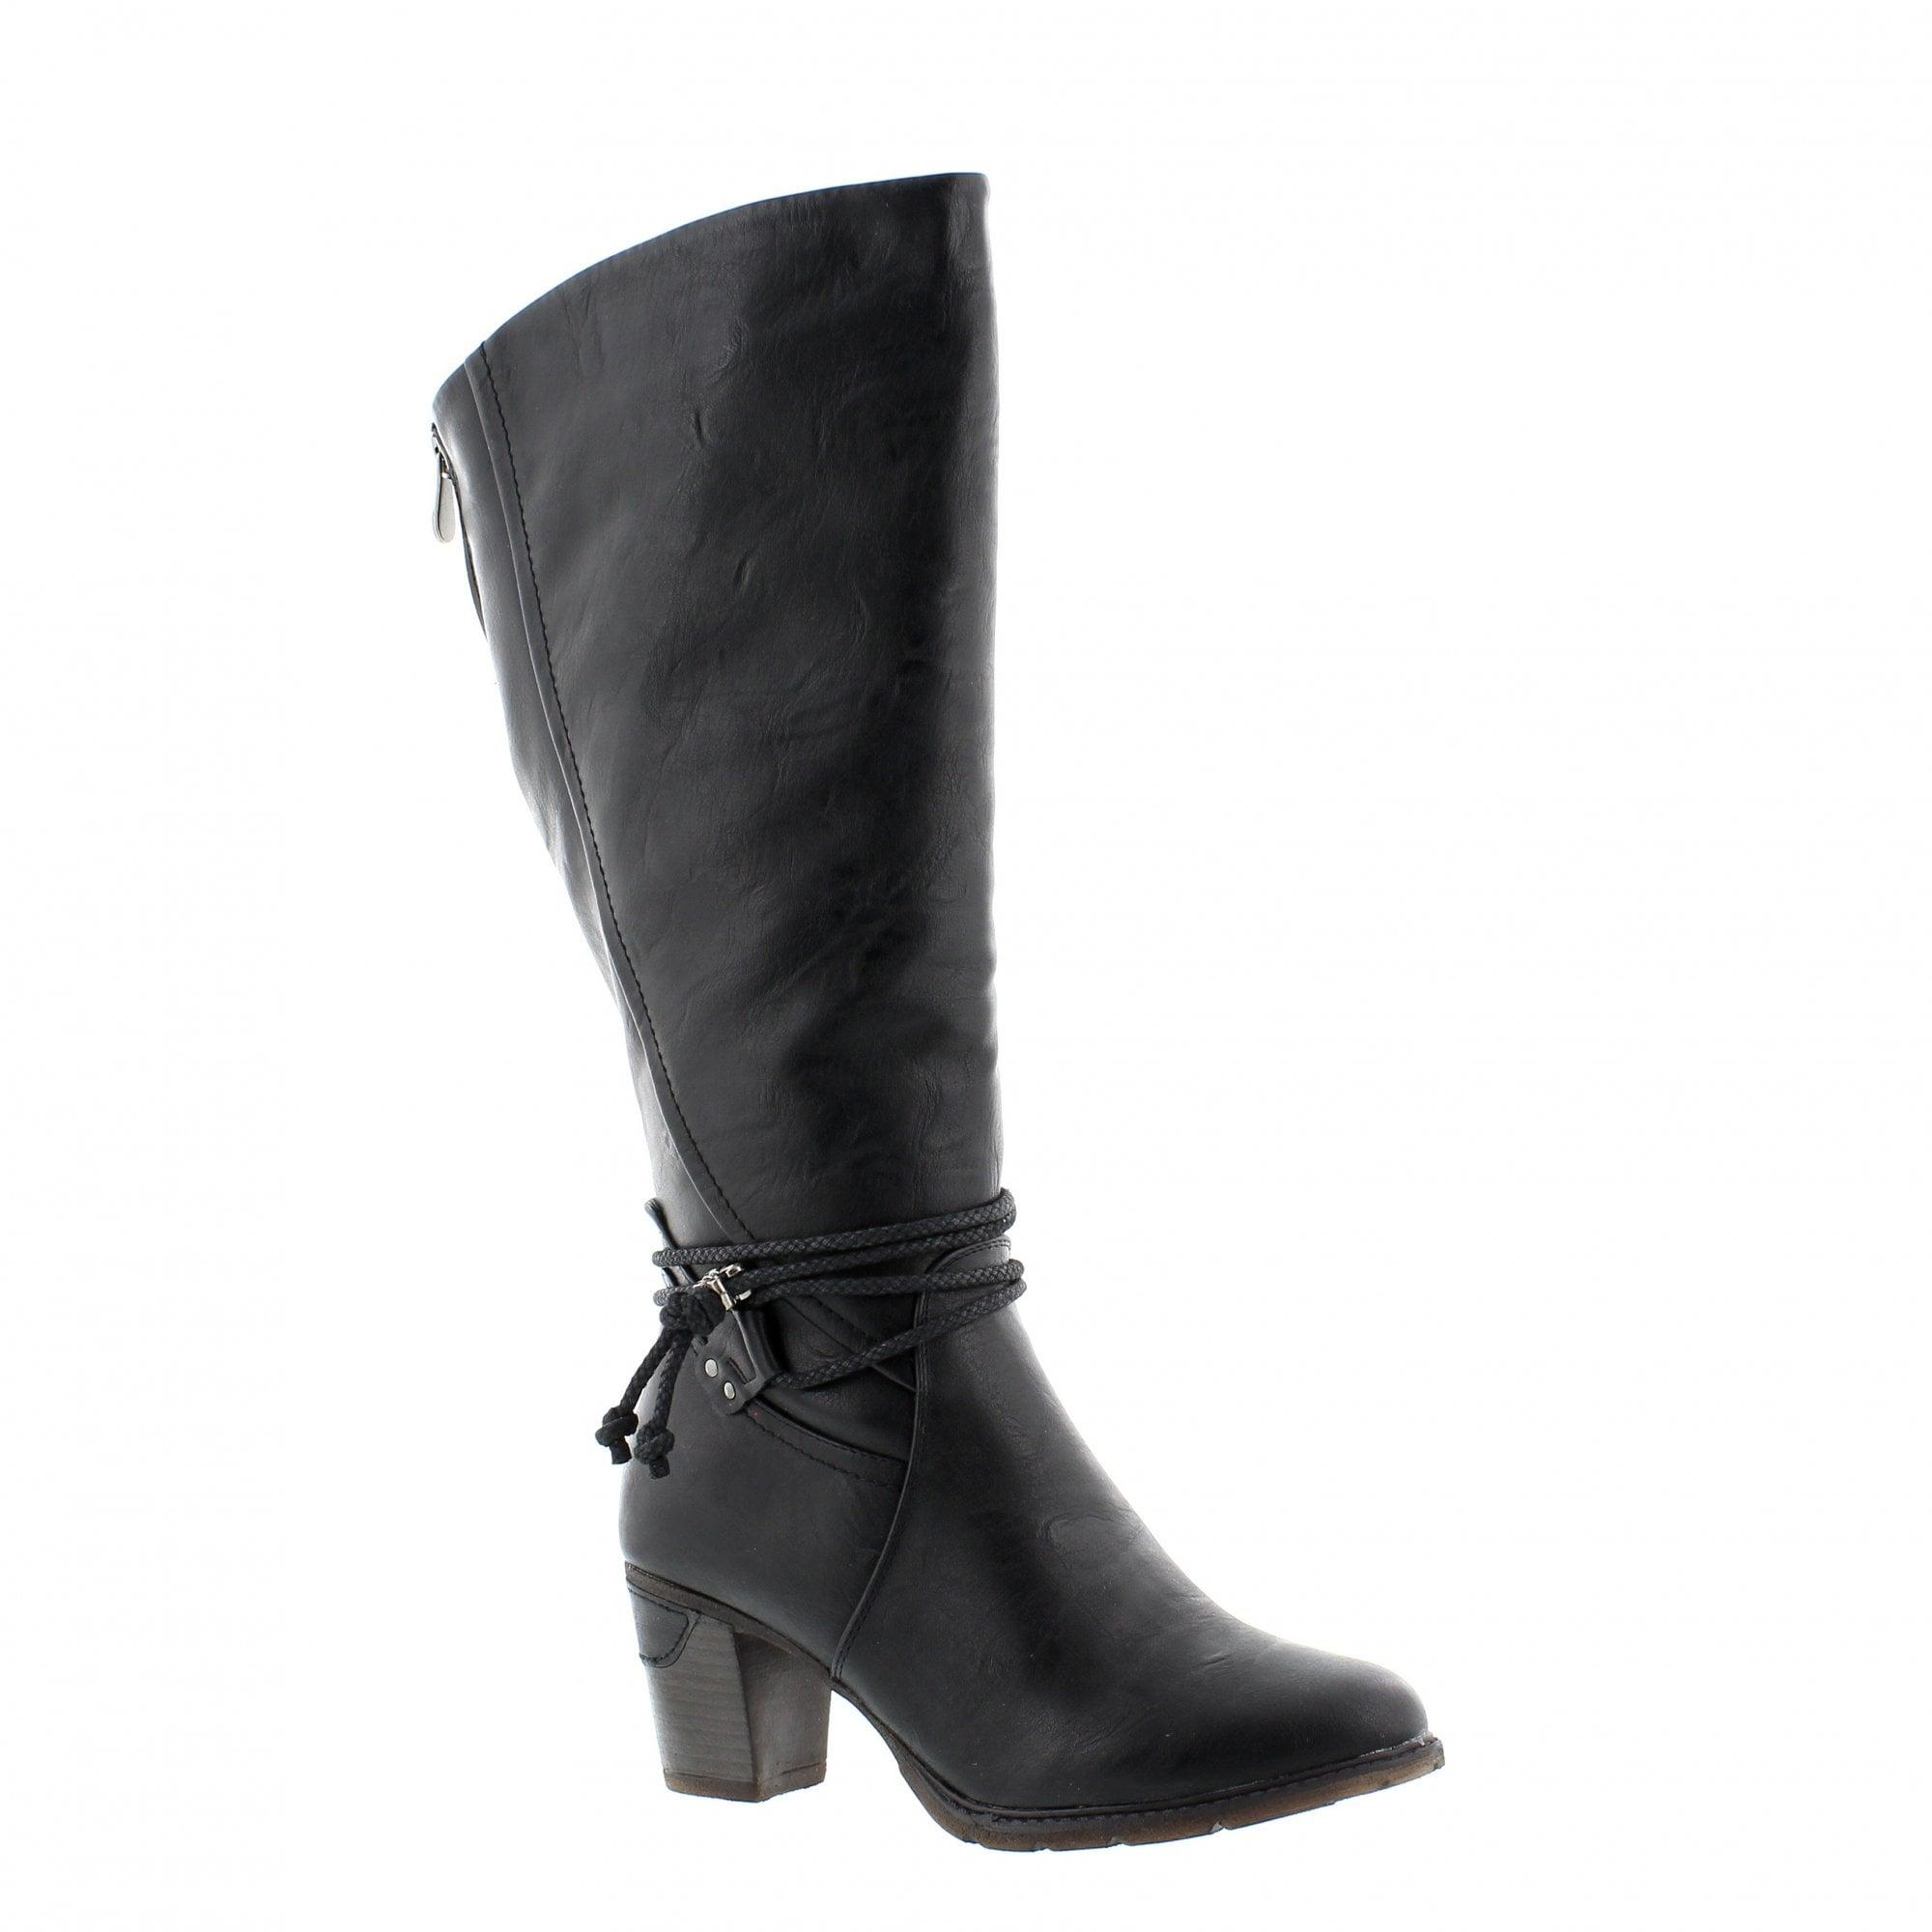 a50e2f57ff38cf Rieker 96059-00 Black Womens Knee High Boots